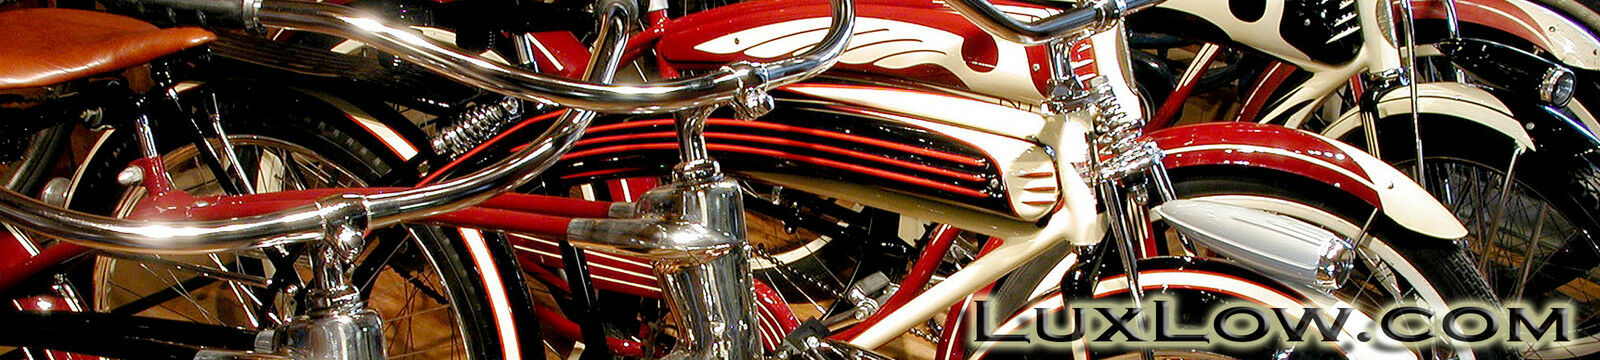 luxlowbikes